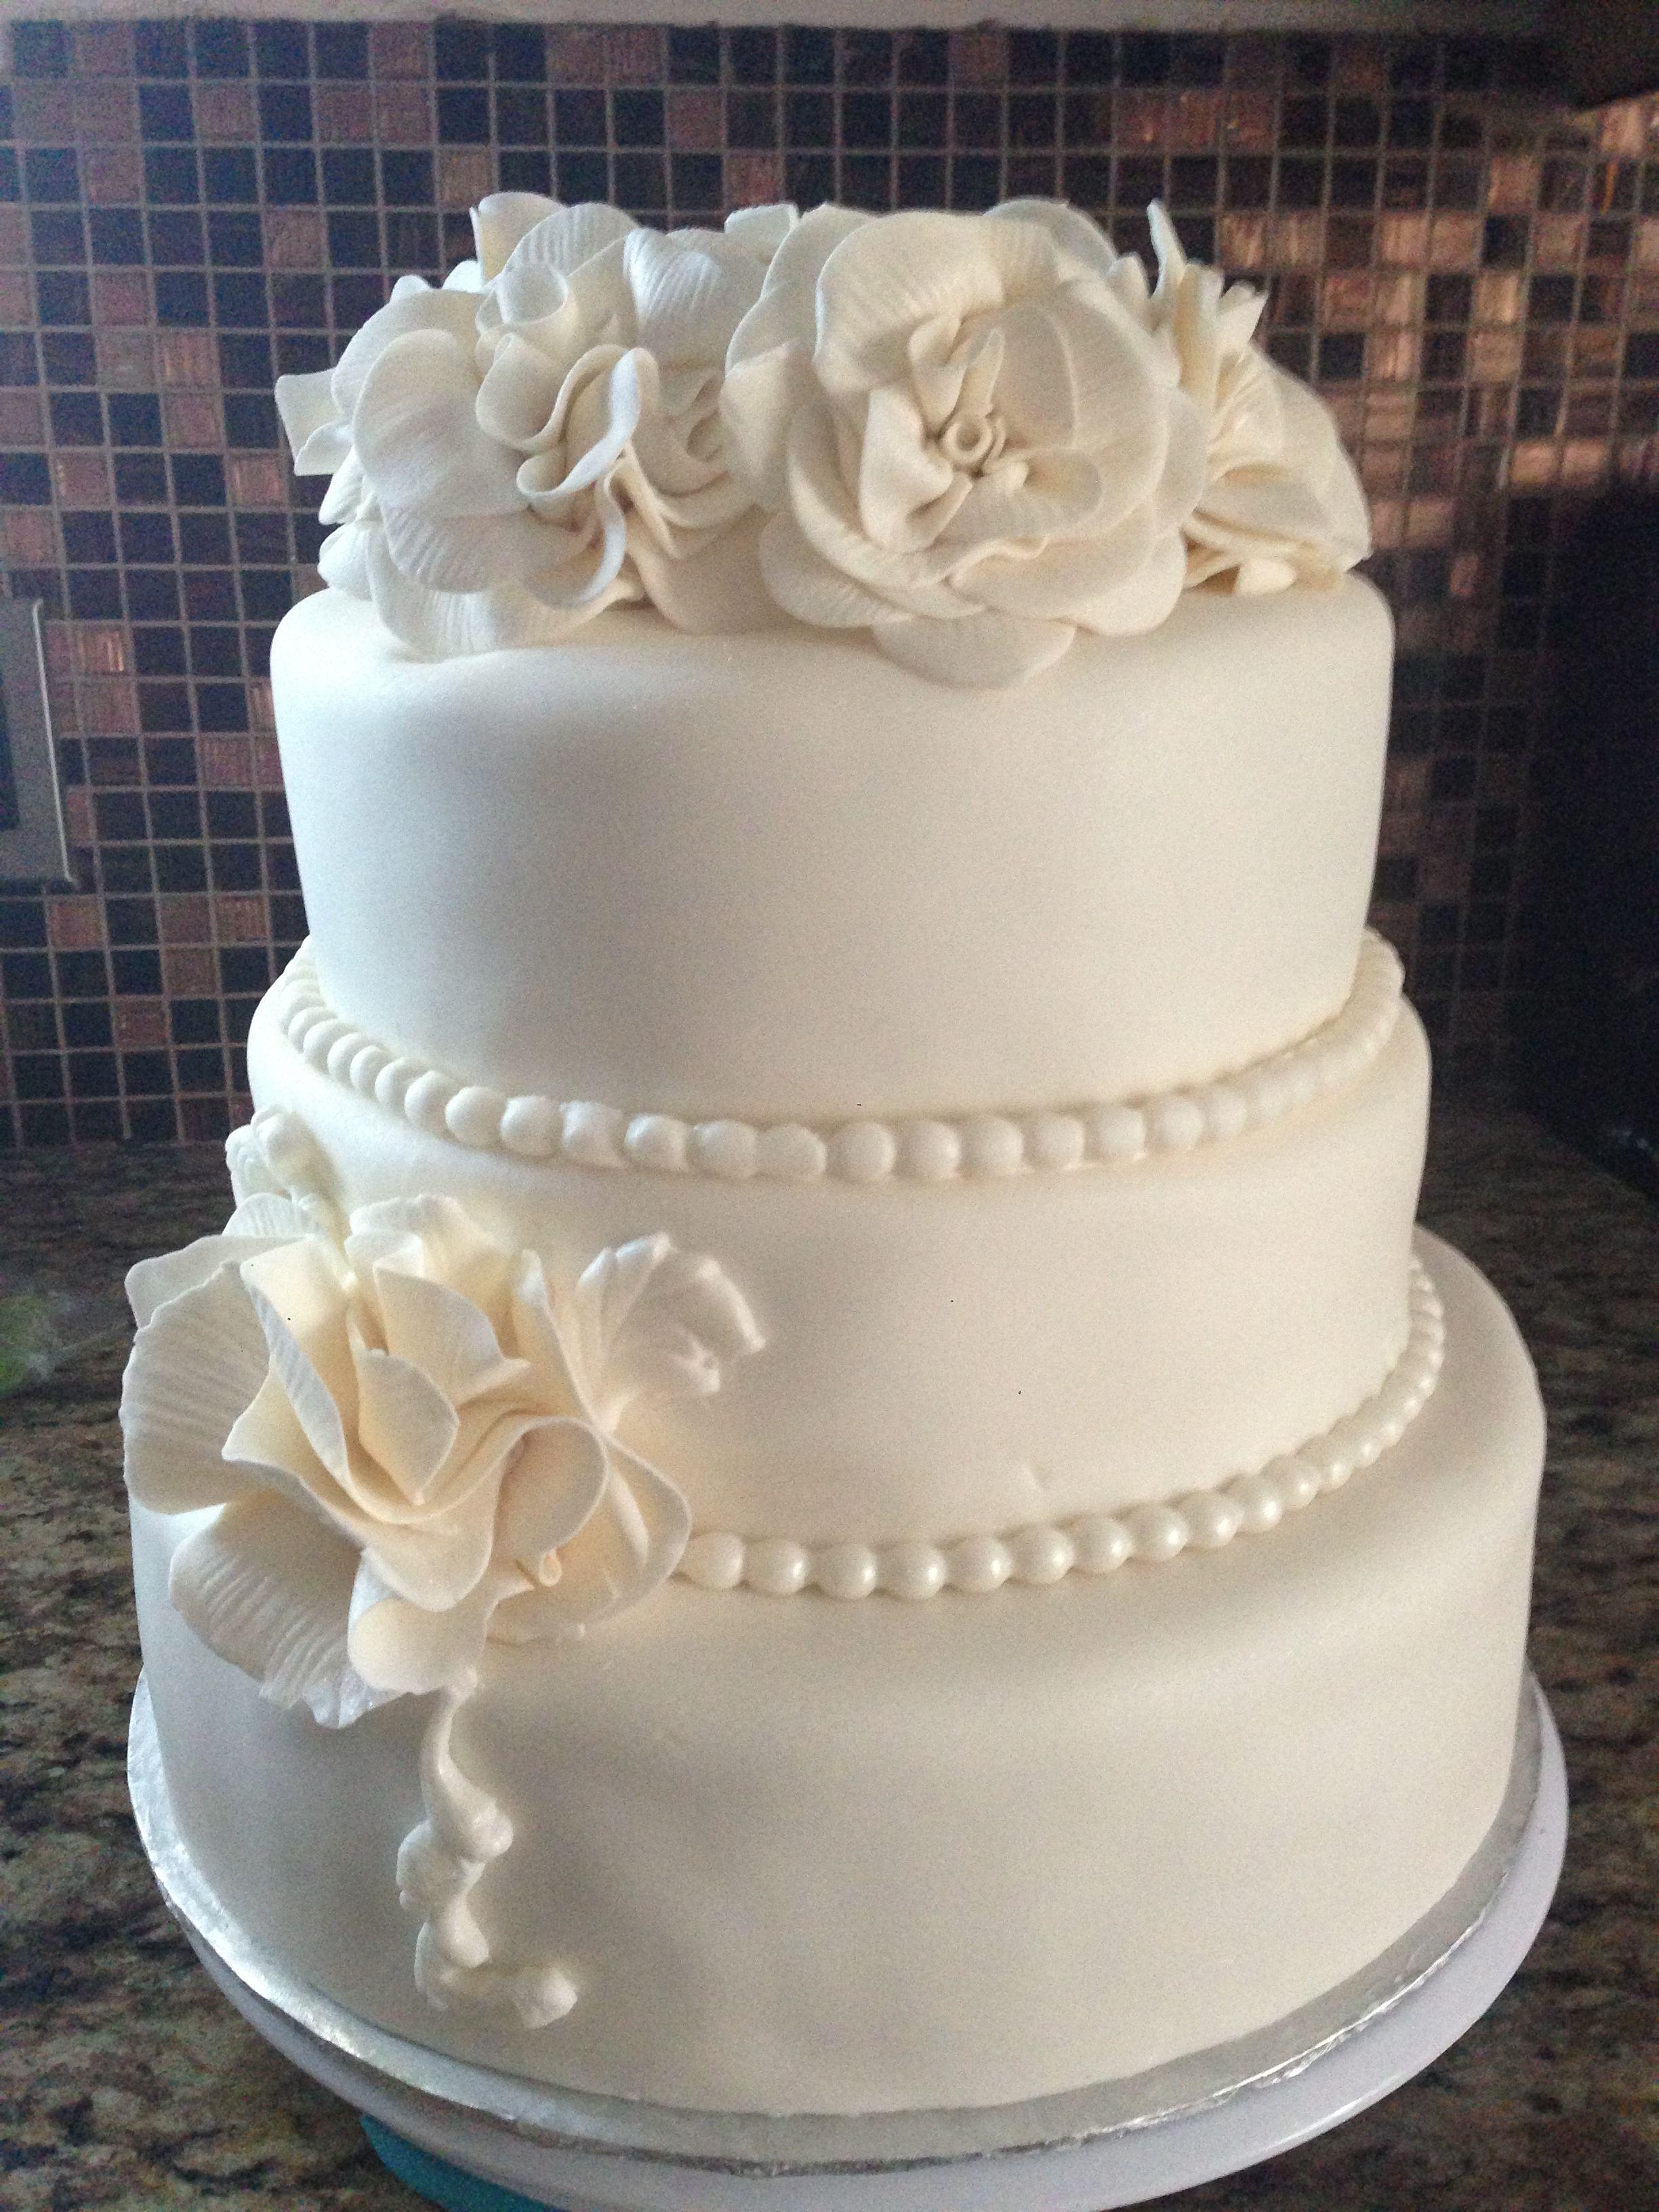 Wedding anniversary cake Cakes 60th anniversary cakes